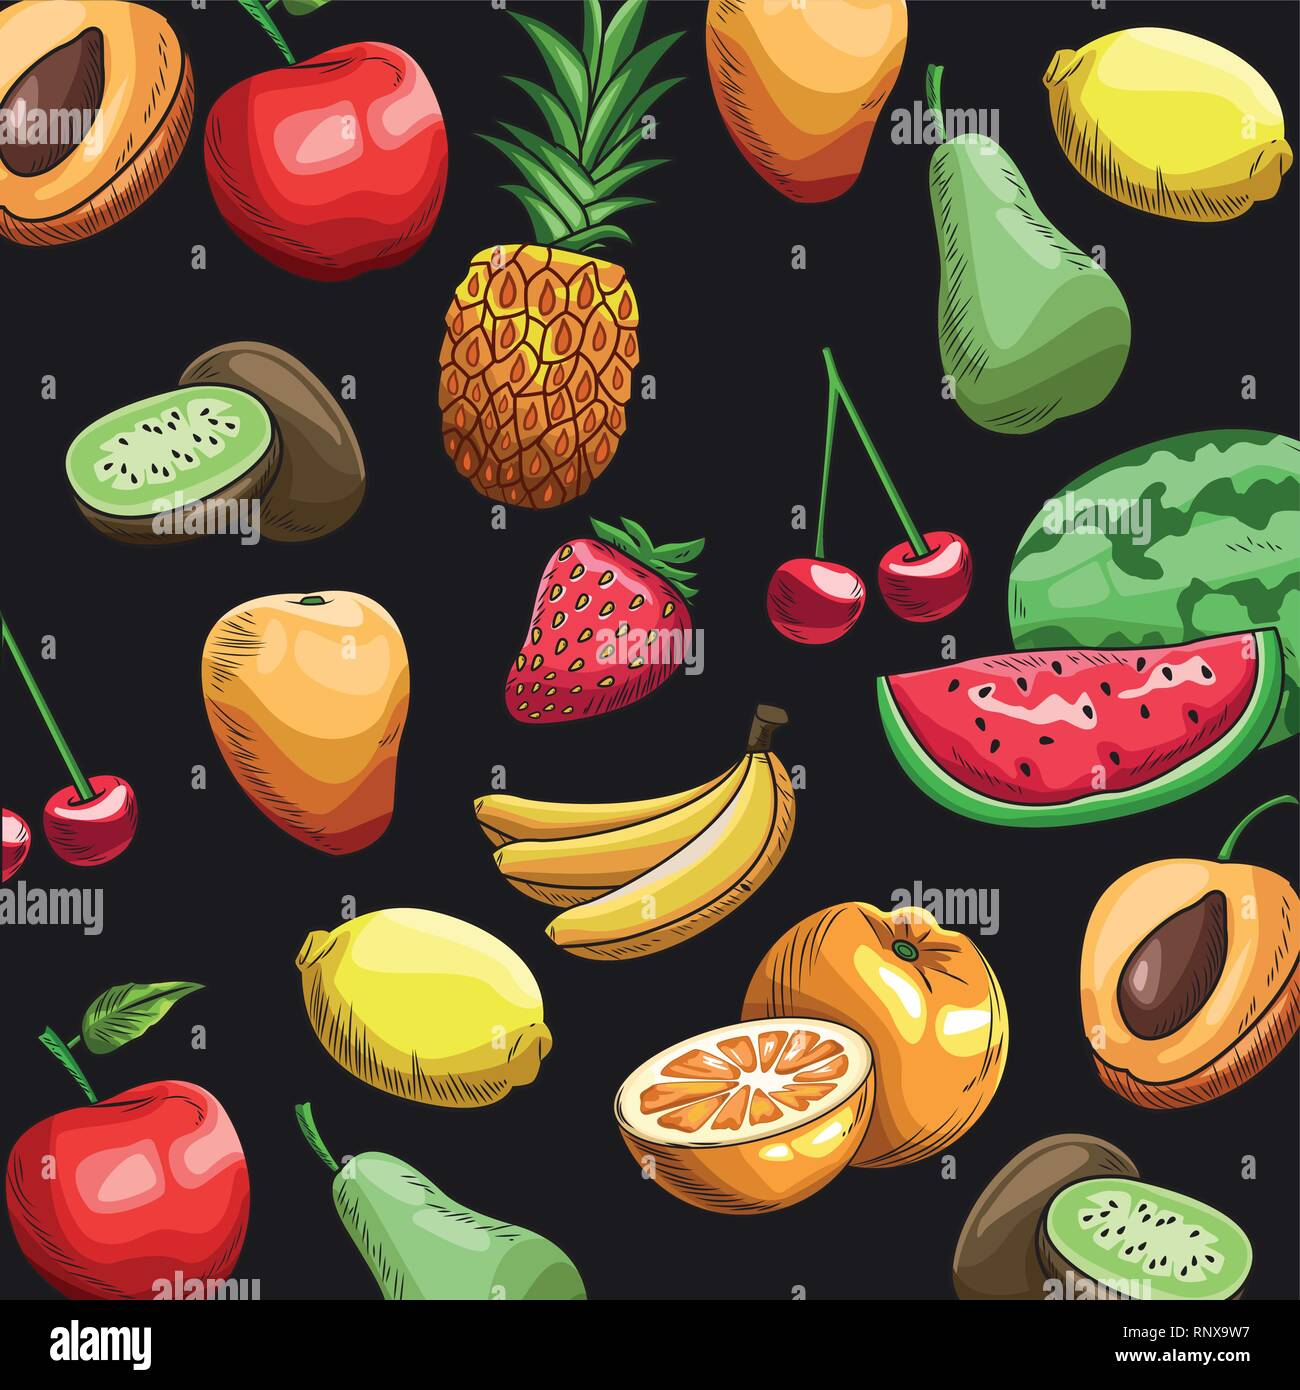 Hand Drawn Fruits Wallpaper Stock Vector Image Art Alamy